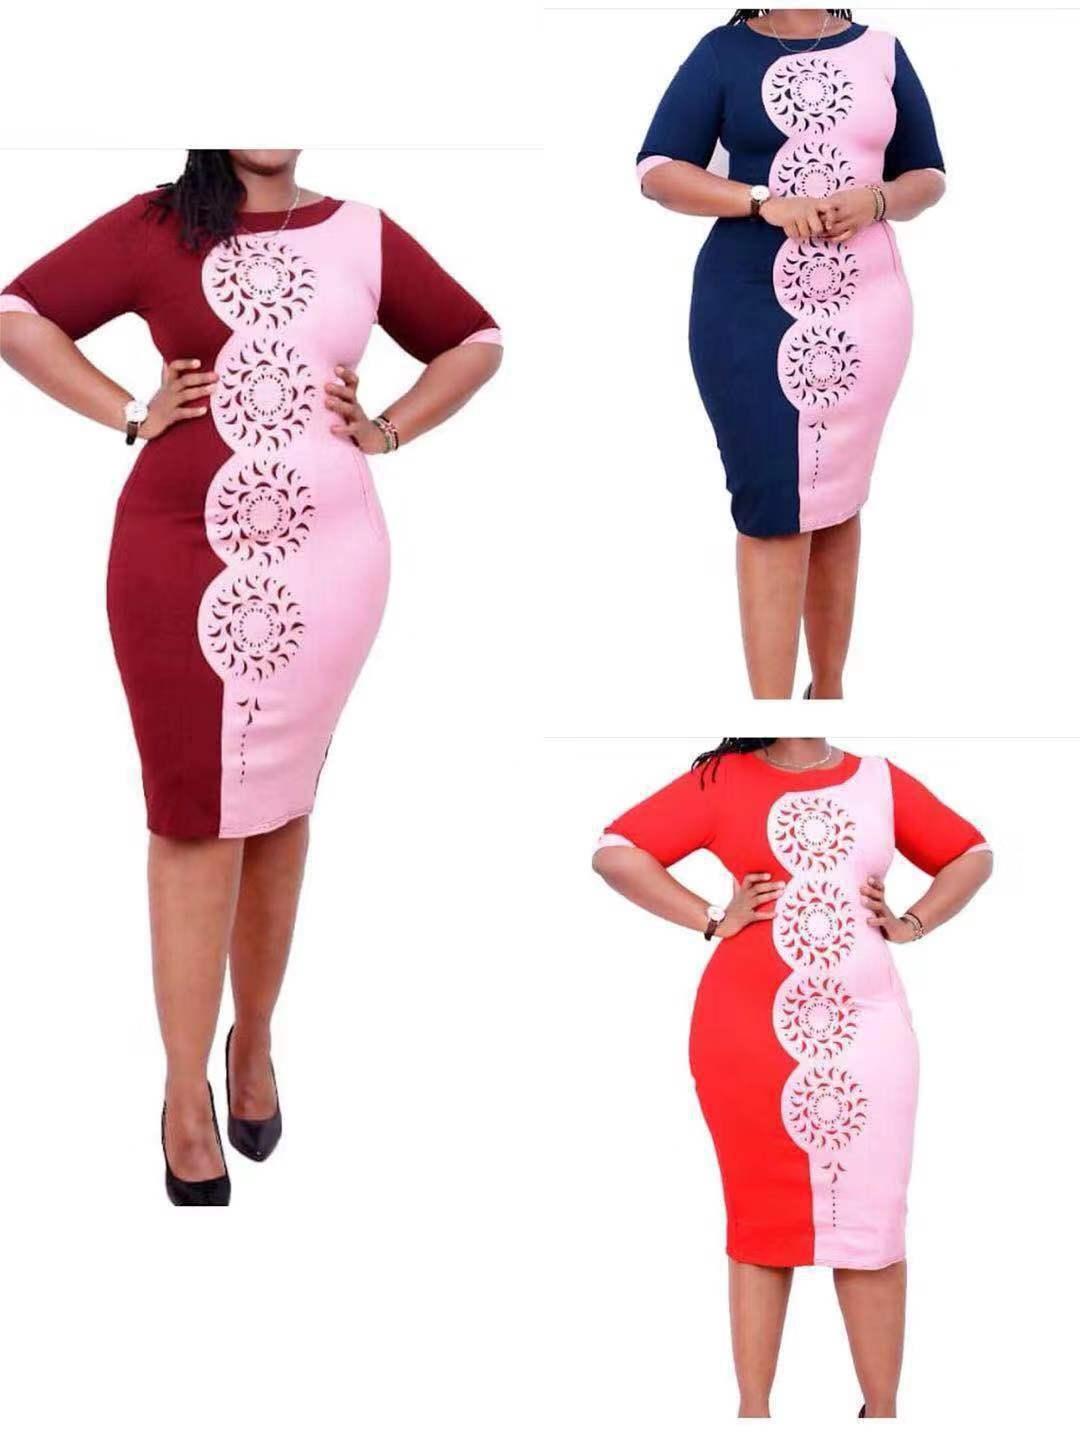 2019 Autumn Elegent Fashion Style African Women O-neck Plus Size Knee-length Dress L-3XL